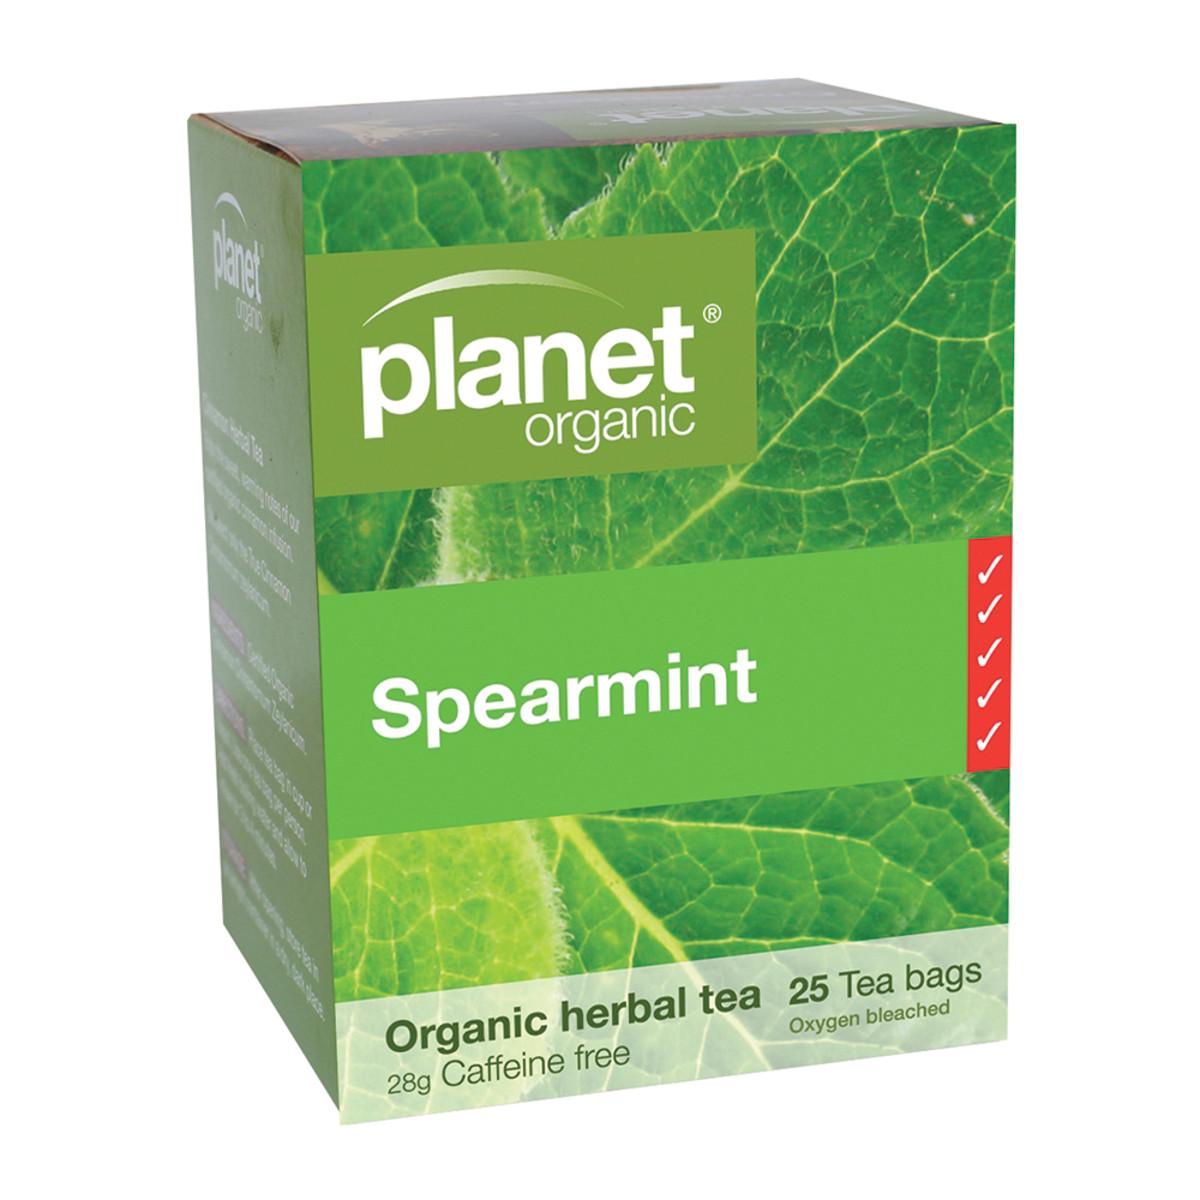 PLANET ORGANIC SPEARMINT TEA ORG 25TB